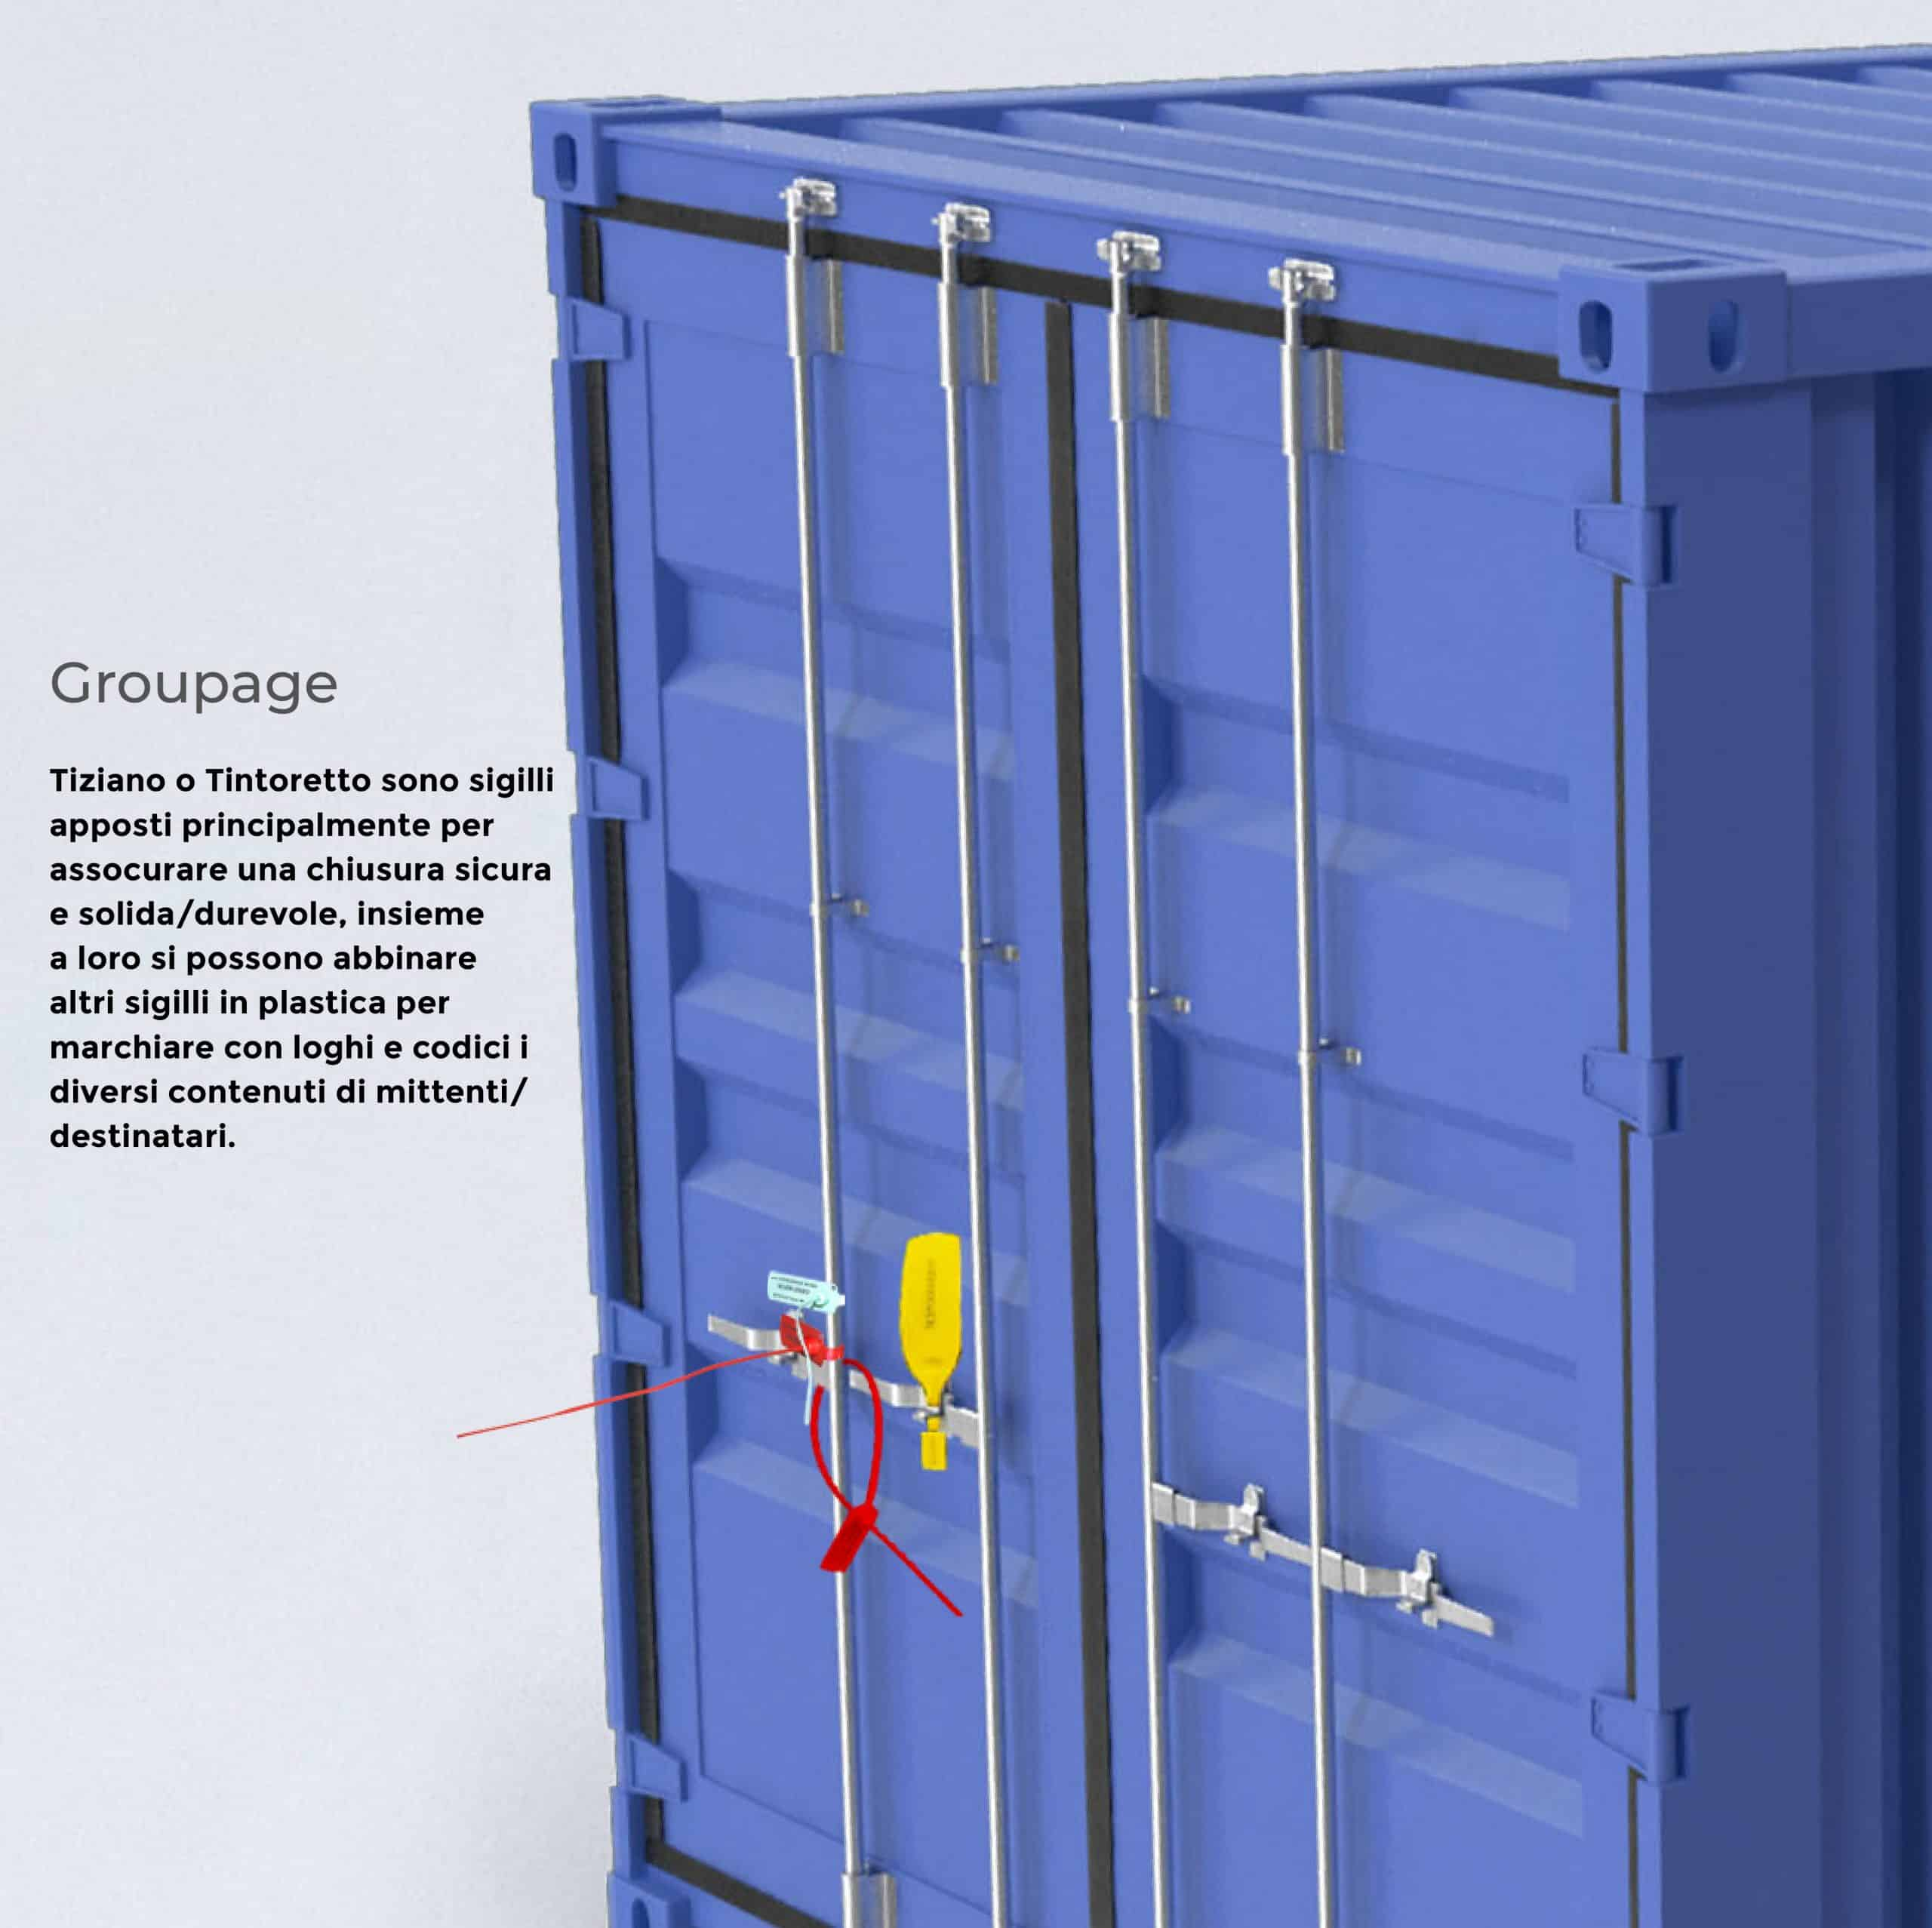 Groupage Sigilli di sicurezza Oniloc